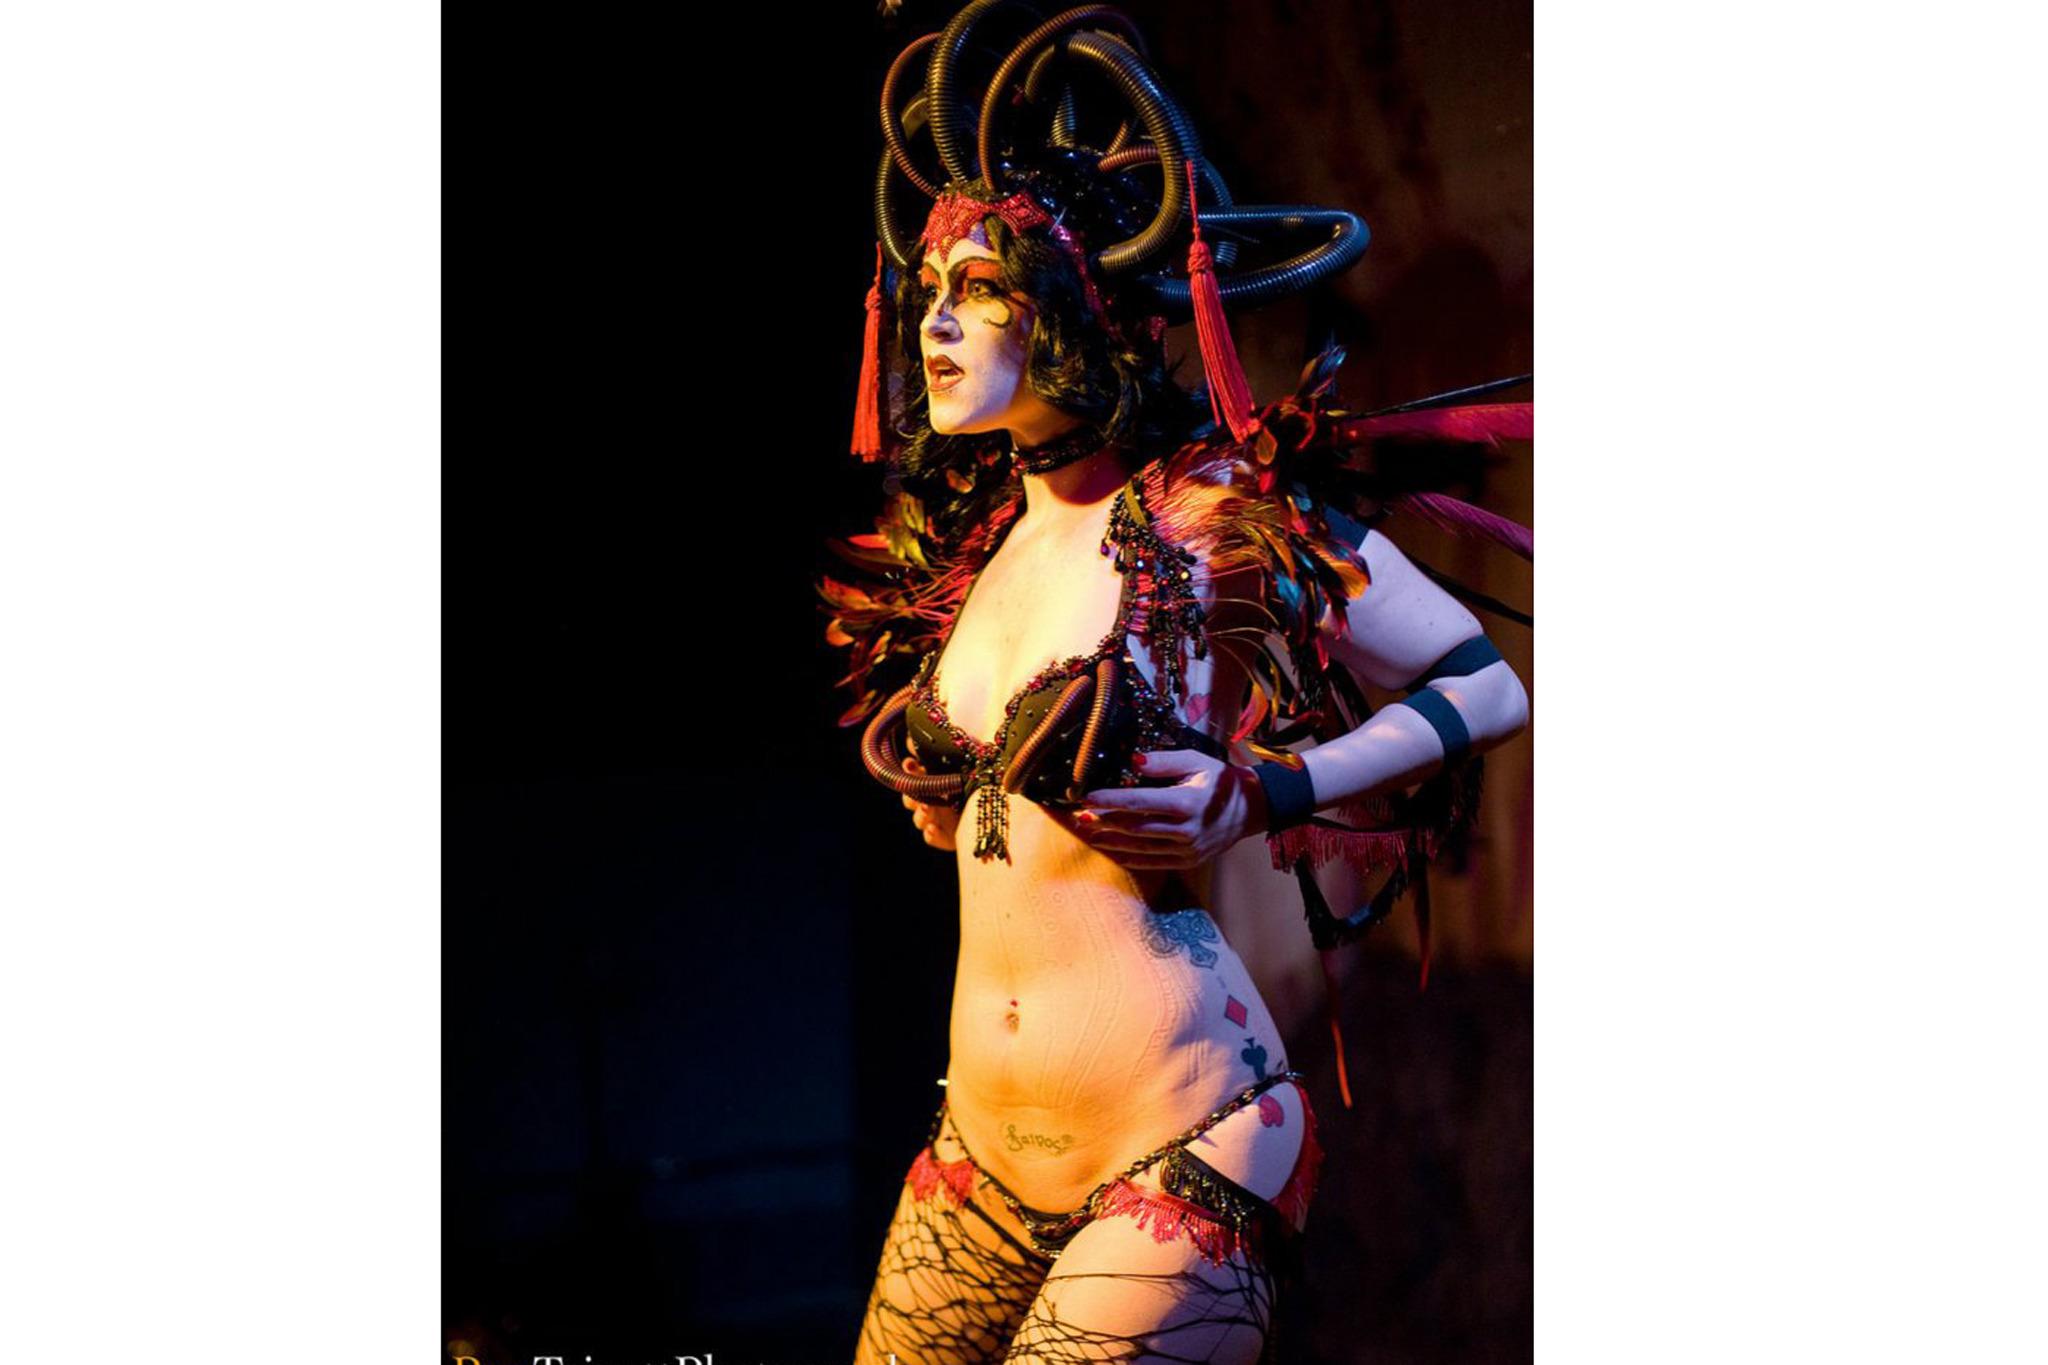 Best burlesque shows in NYC